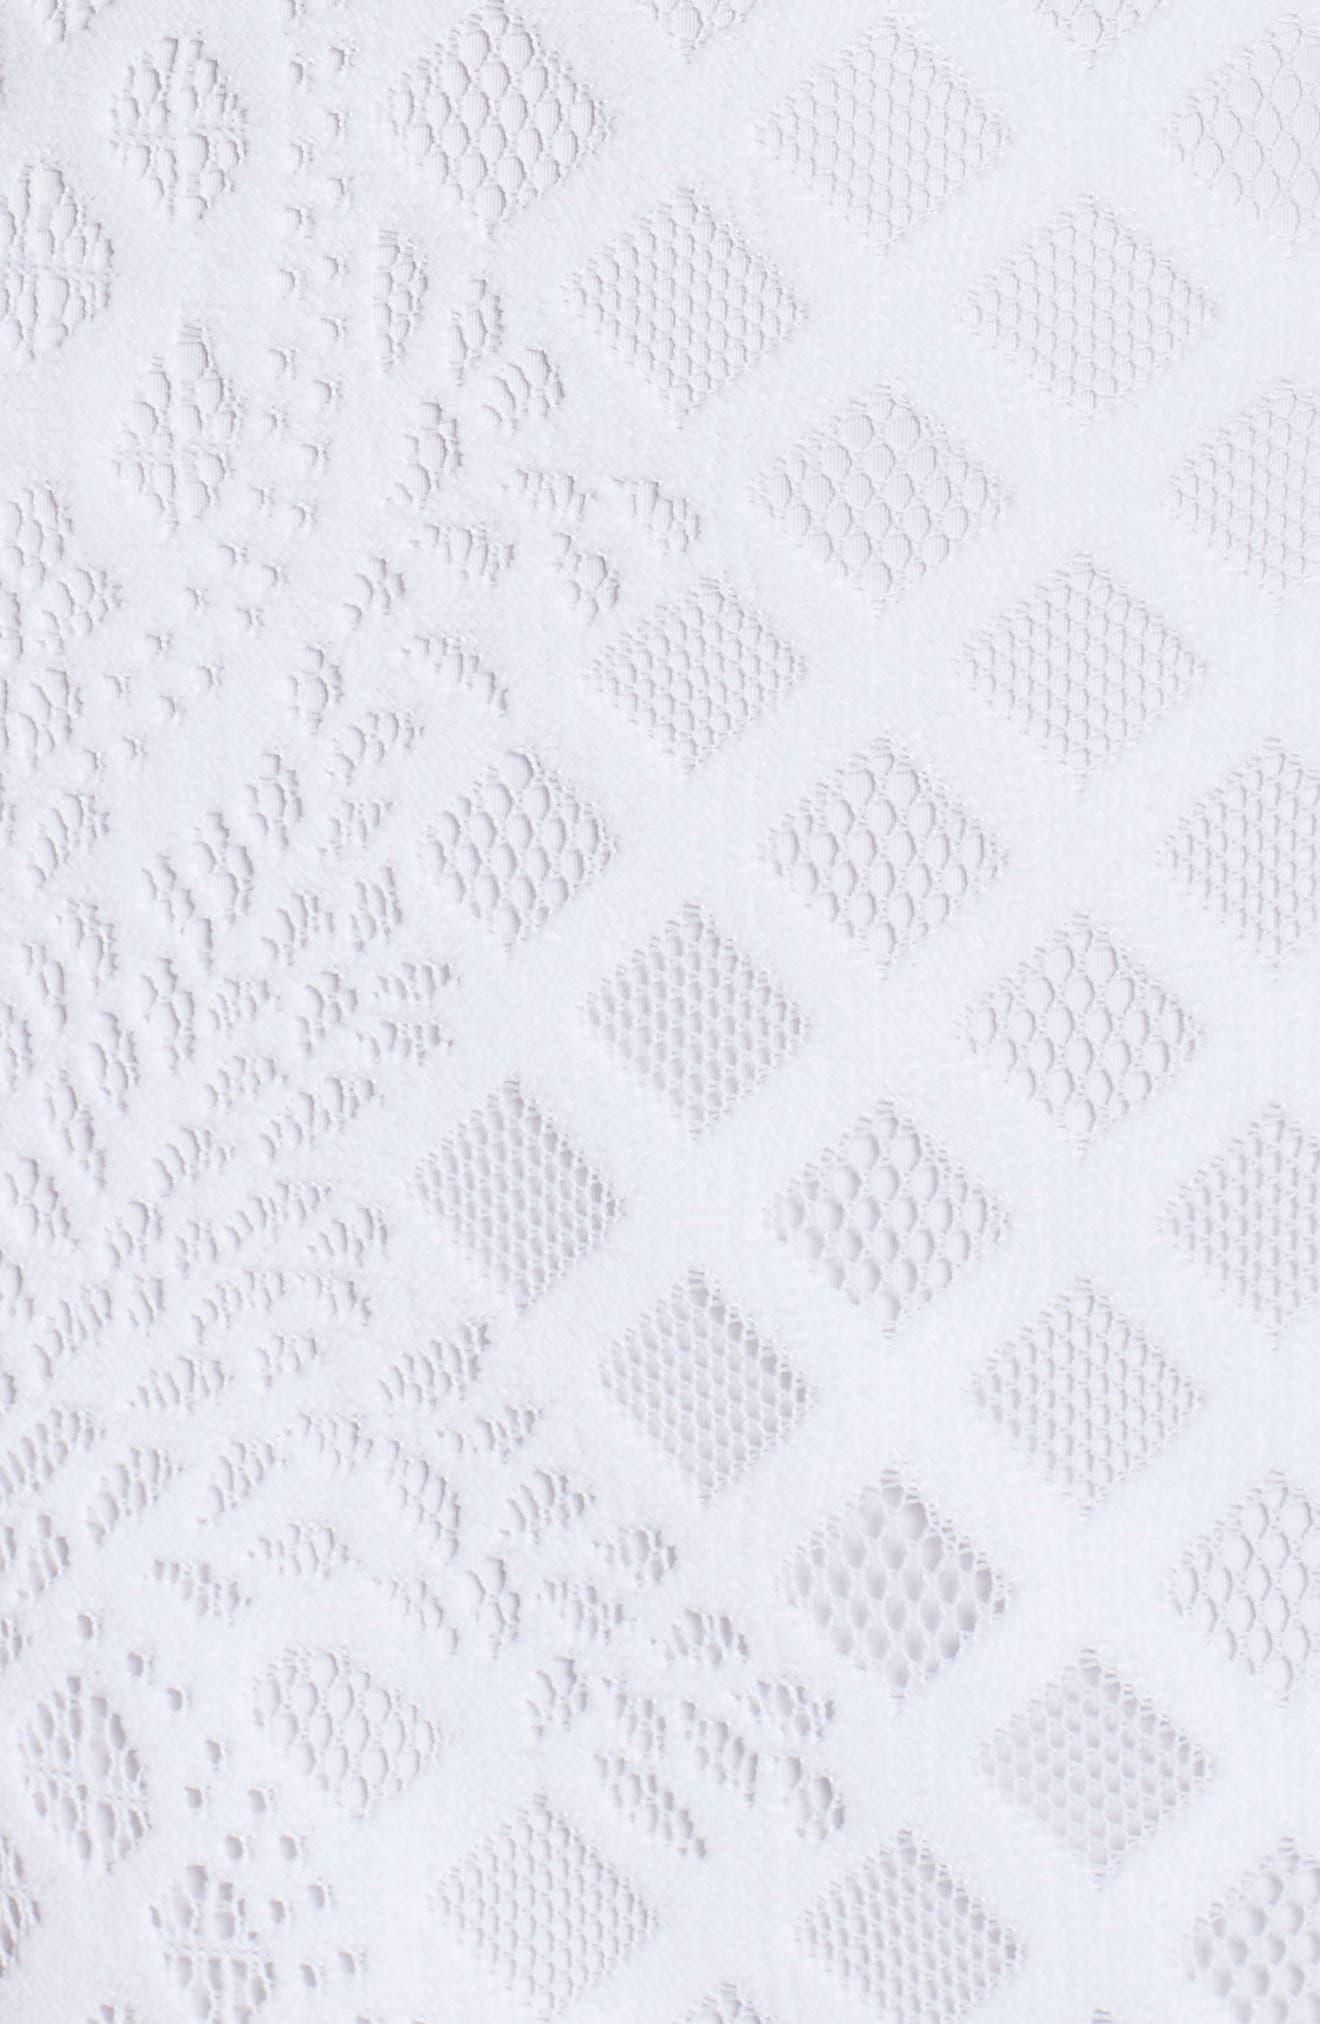 Pearl Maxi Dress,                             Alternate thumbnail 5, color,                             Resort White Pineapple Lace